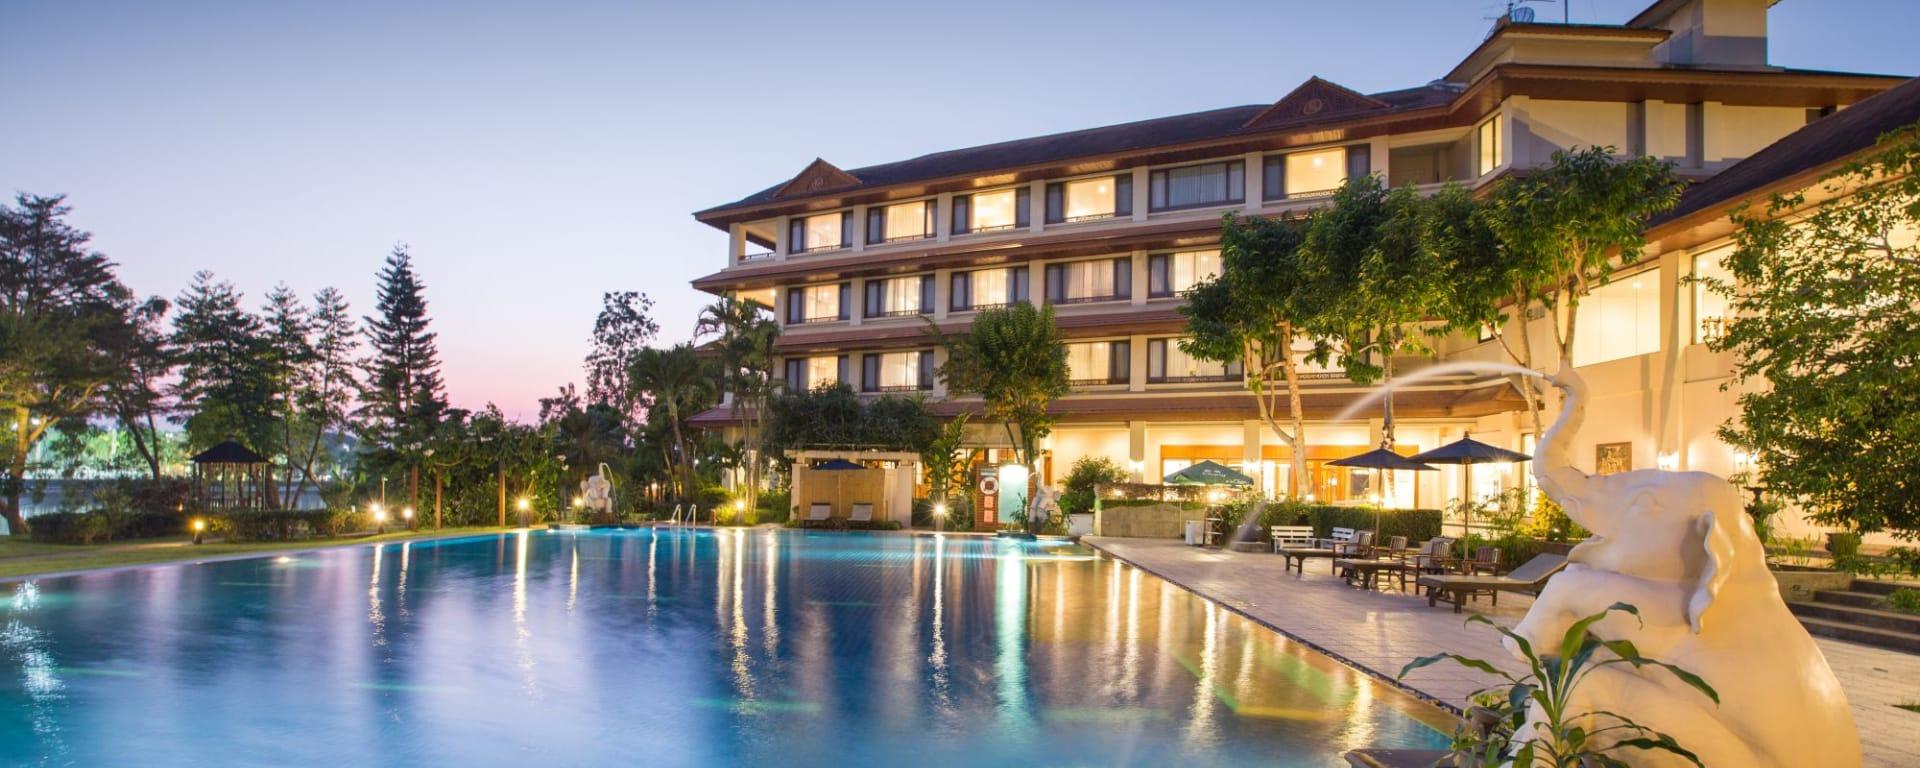 Imperial River House à Chiang Rai: Evening Mood